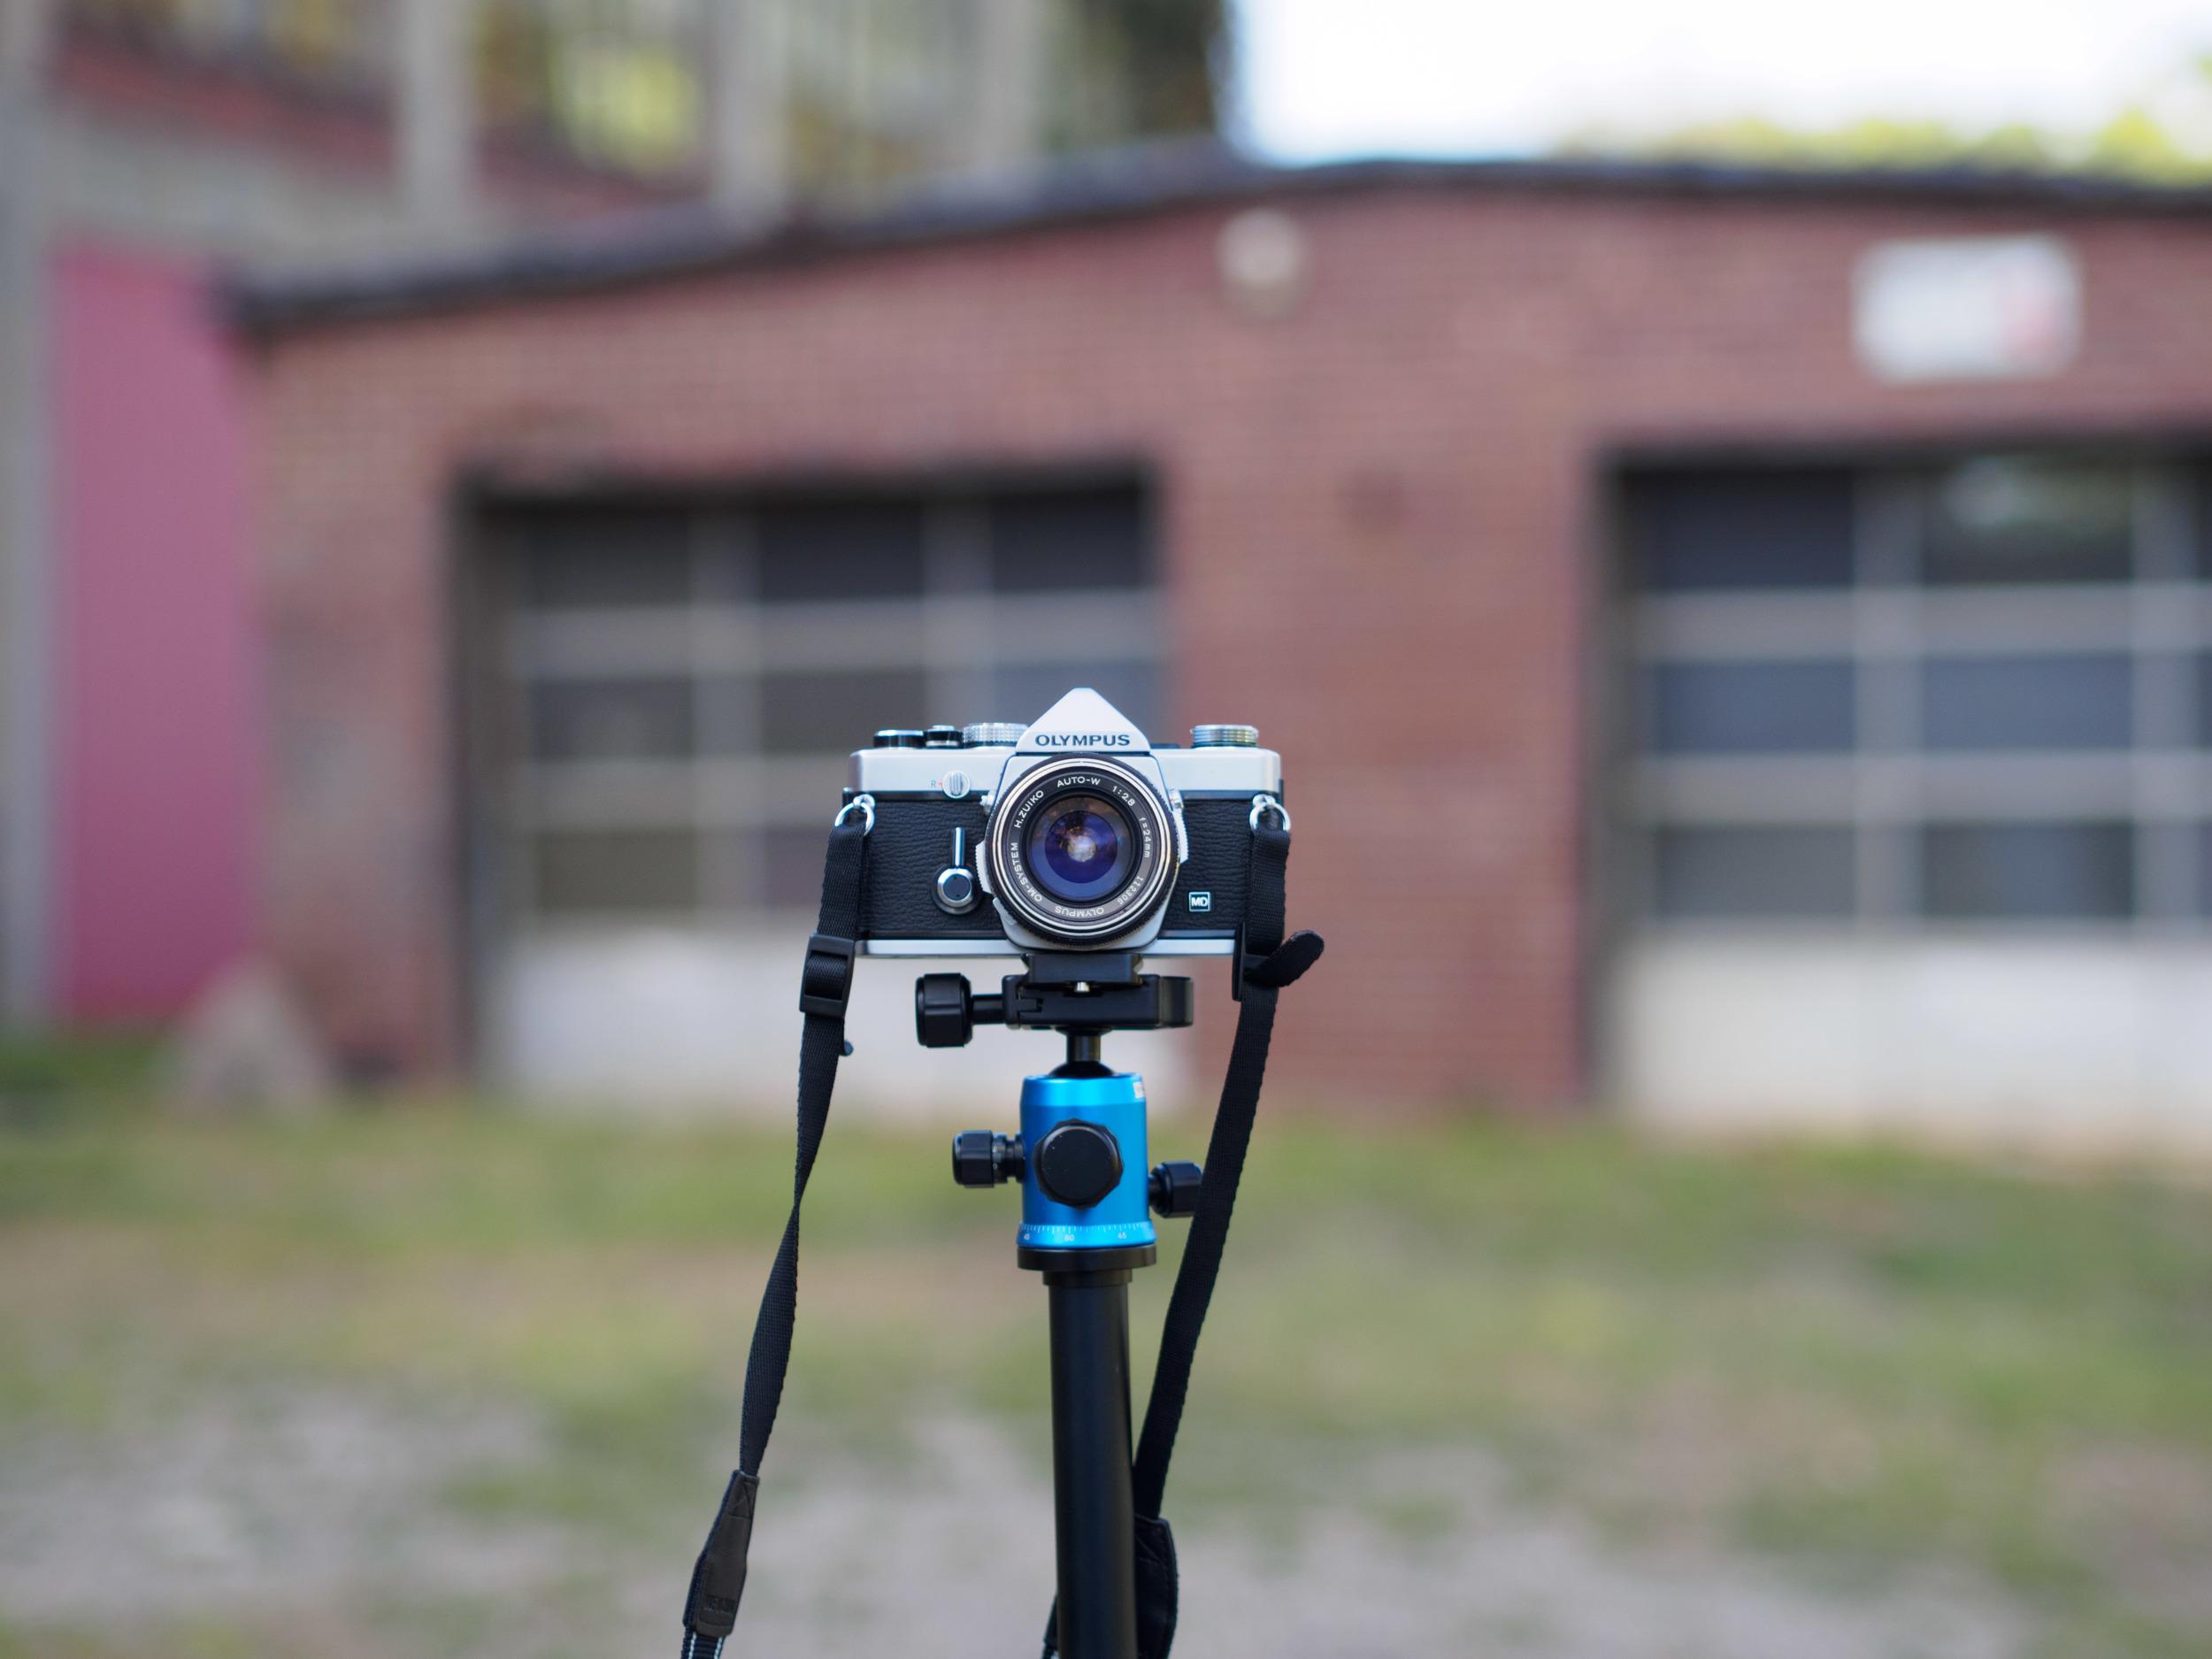 mZuiko 45mm f/1.8 7 feet from subject.